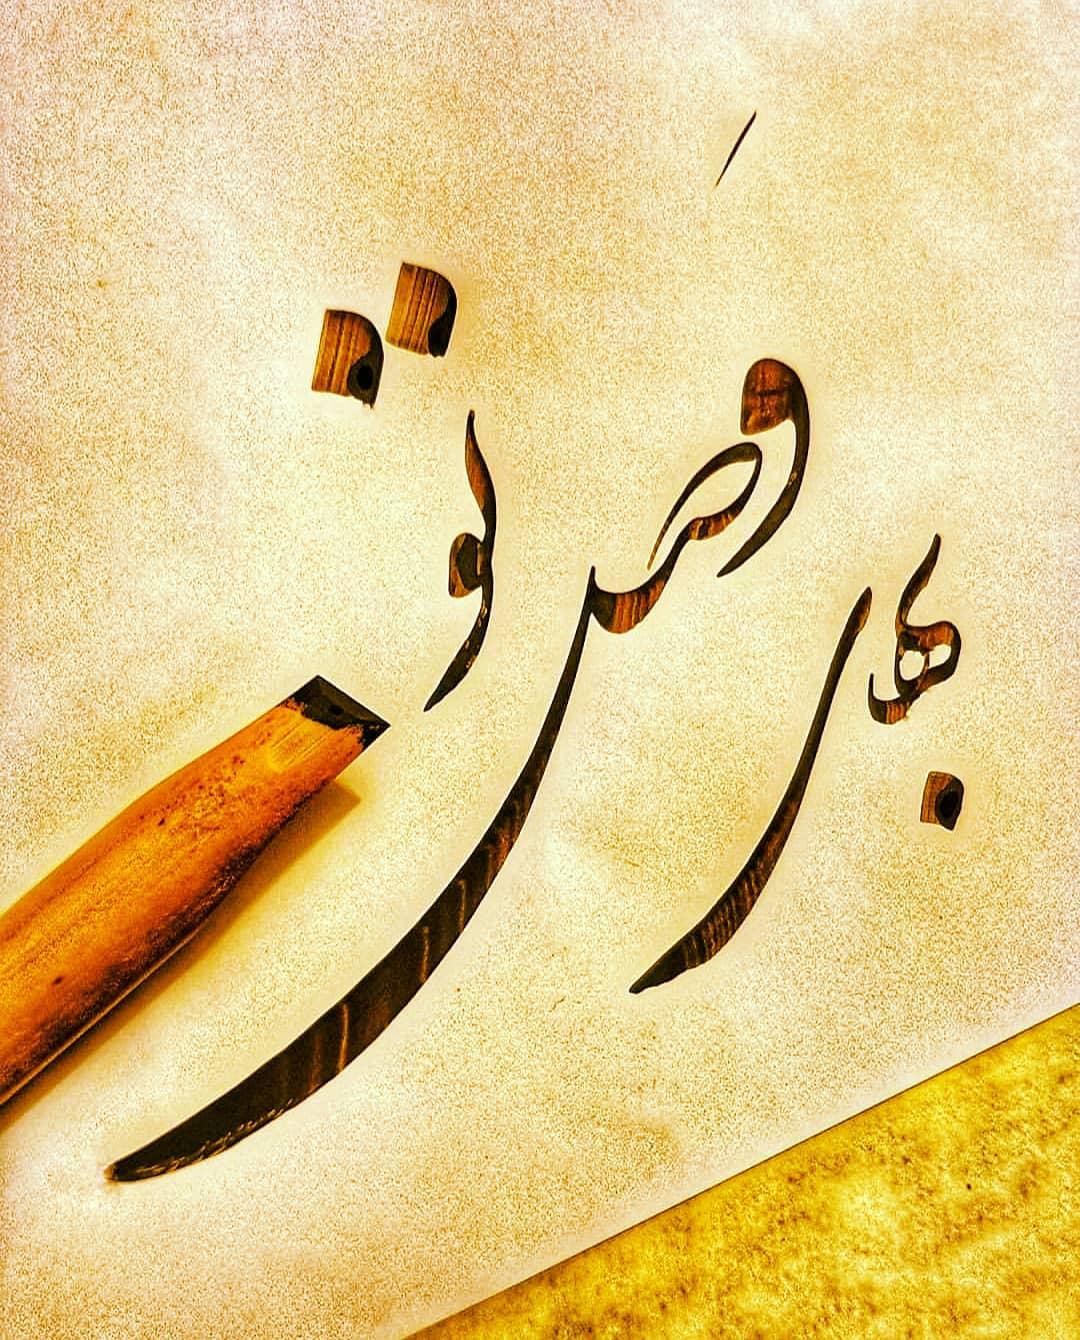 Farisi/Nasta'liq khatestan  ﷽ بهای وصل تو گر جان بود خریداریم … . #حافظ #خطستان  @khatestan #خط_خودکاری#خ… 609